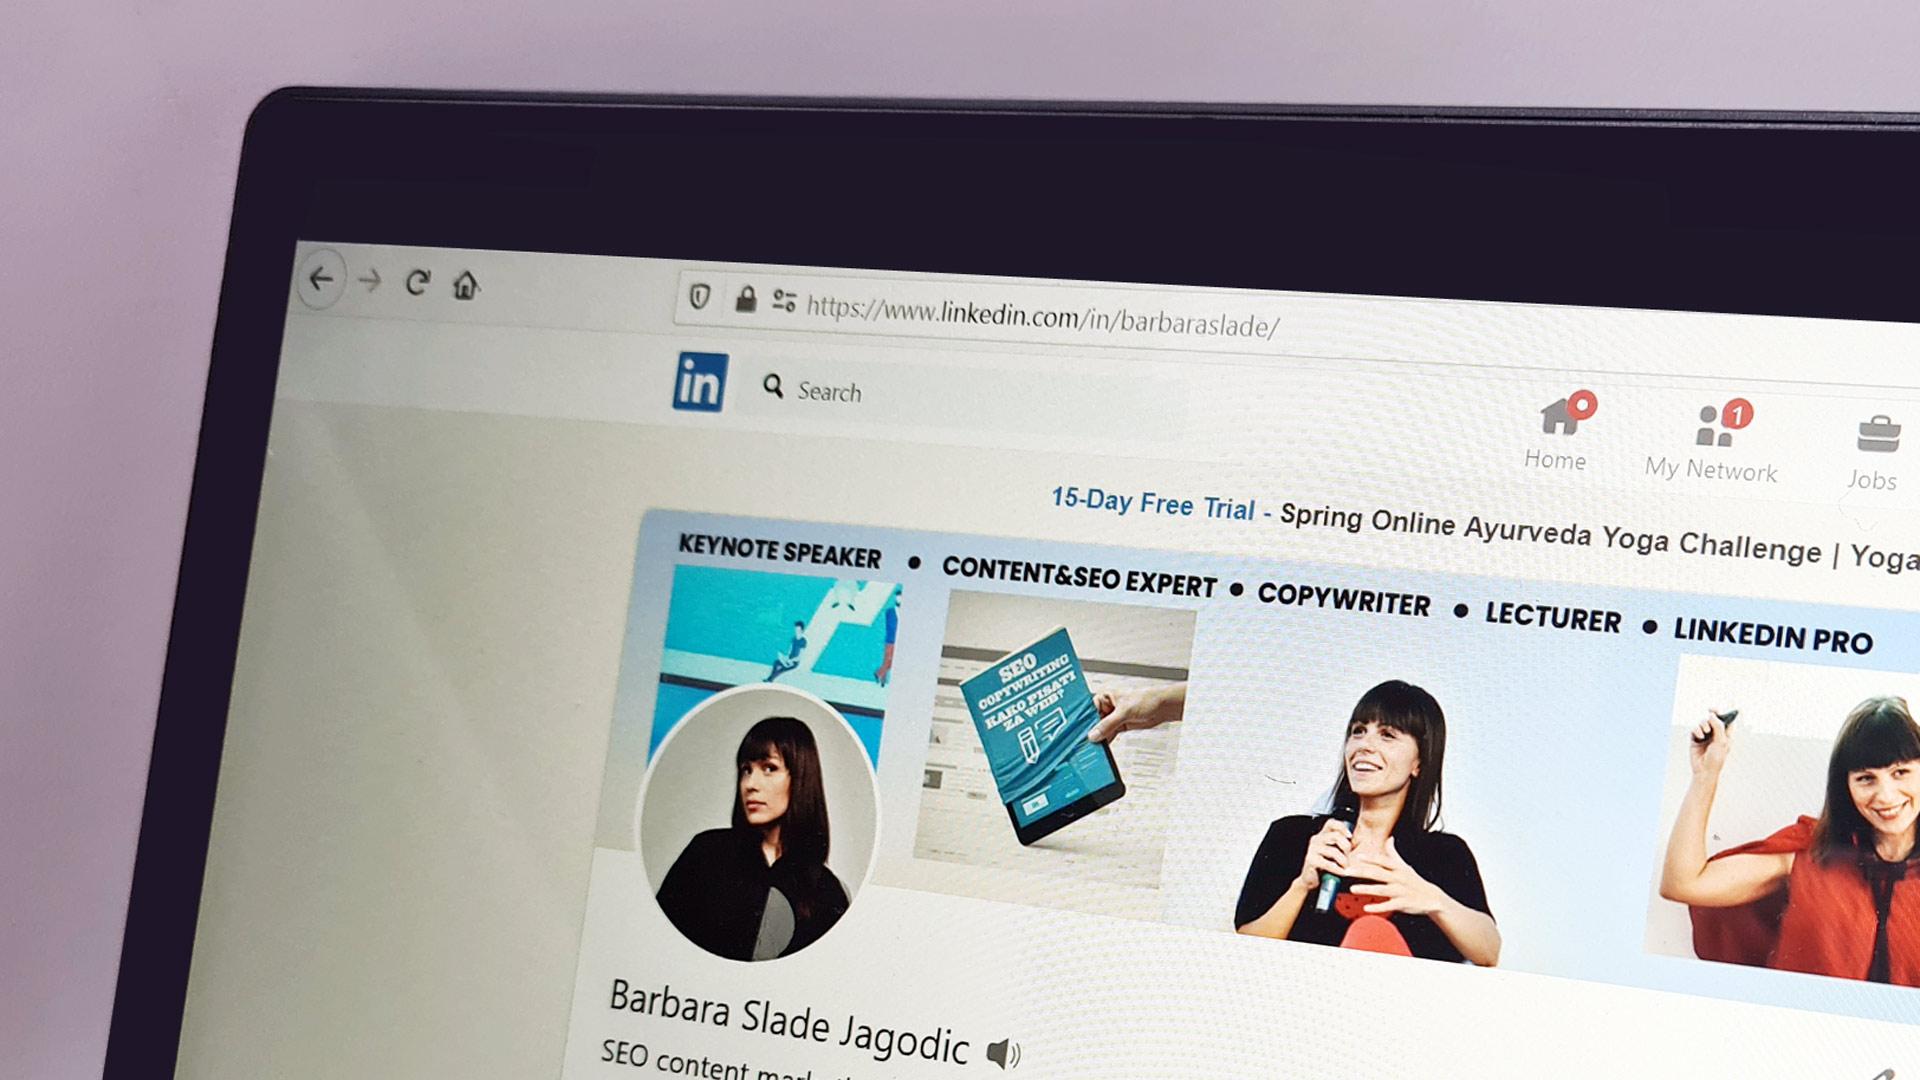 kako napraviti LinkedIn profil